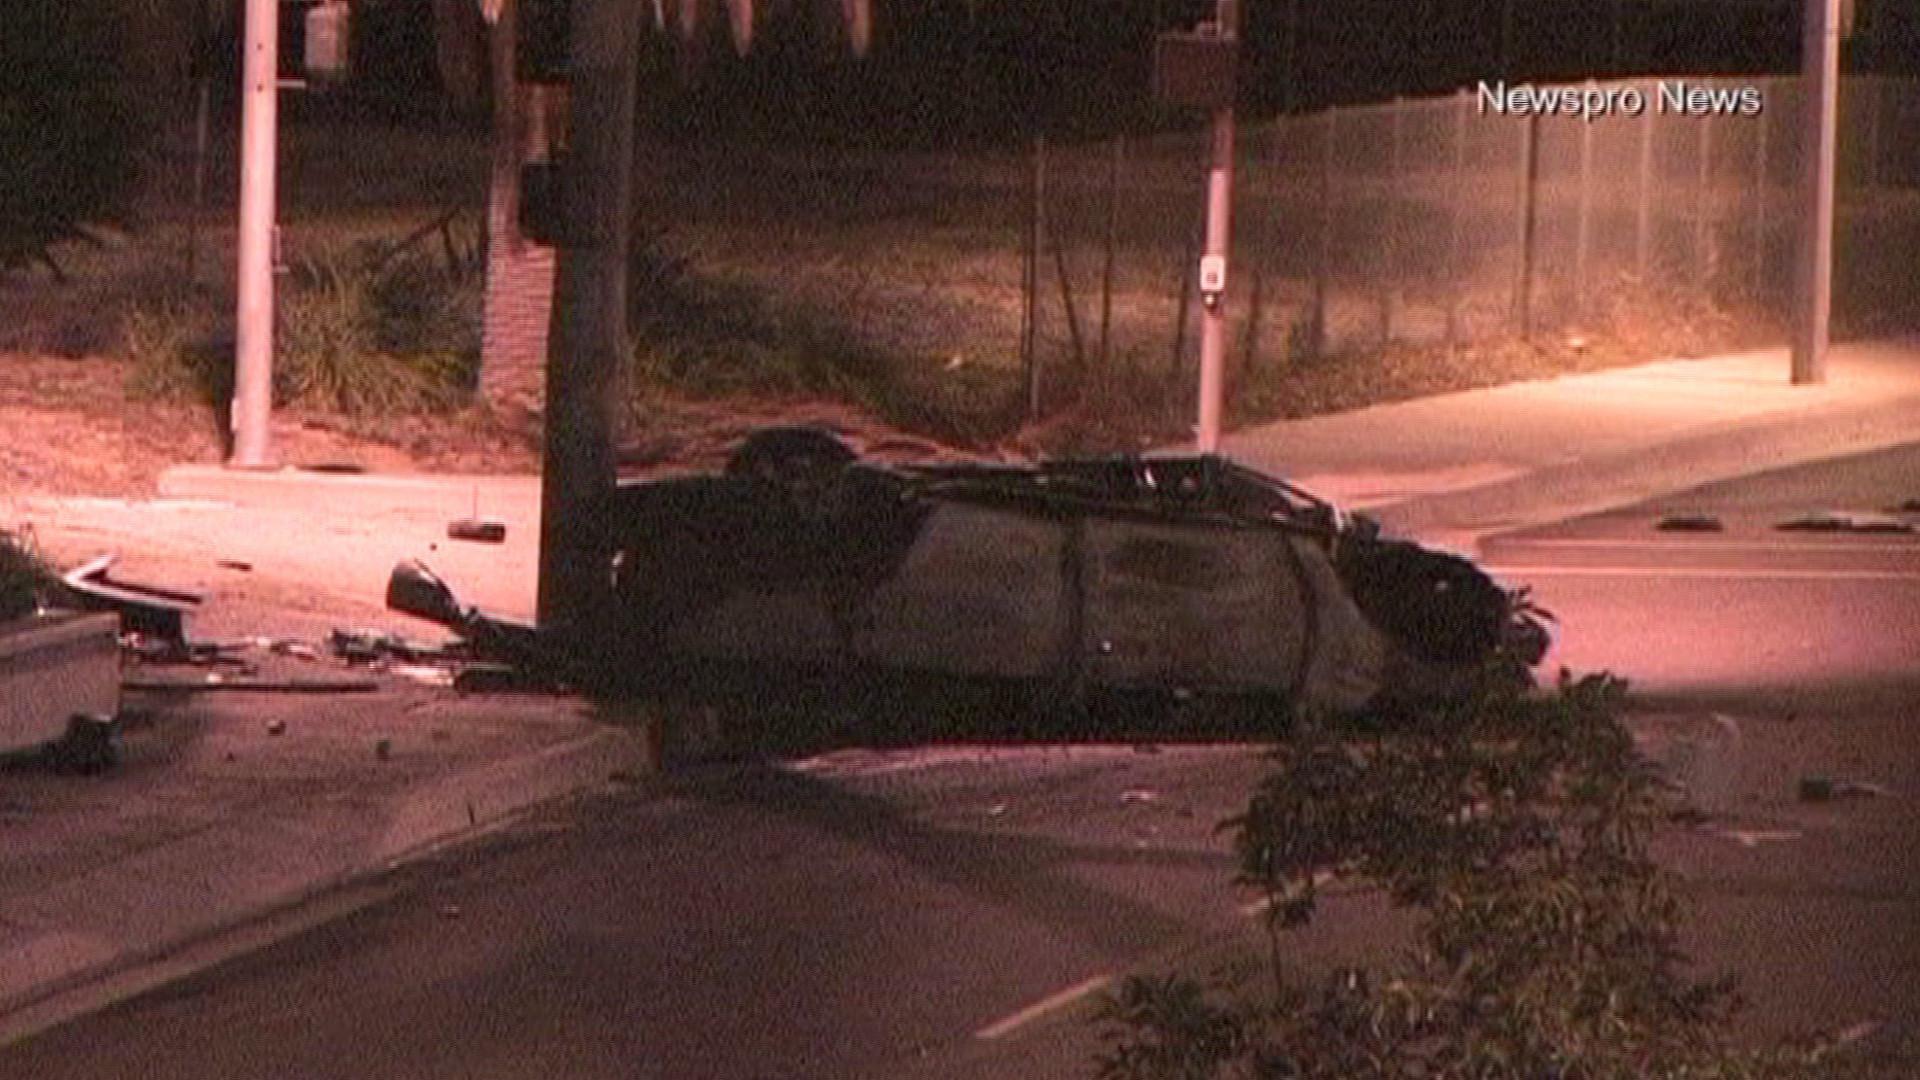 Unlicensed teenage driver loses control, 2 passengers killed in crash